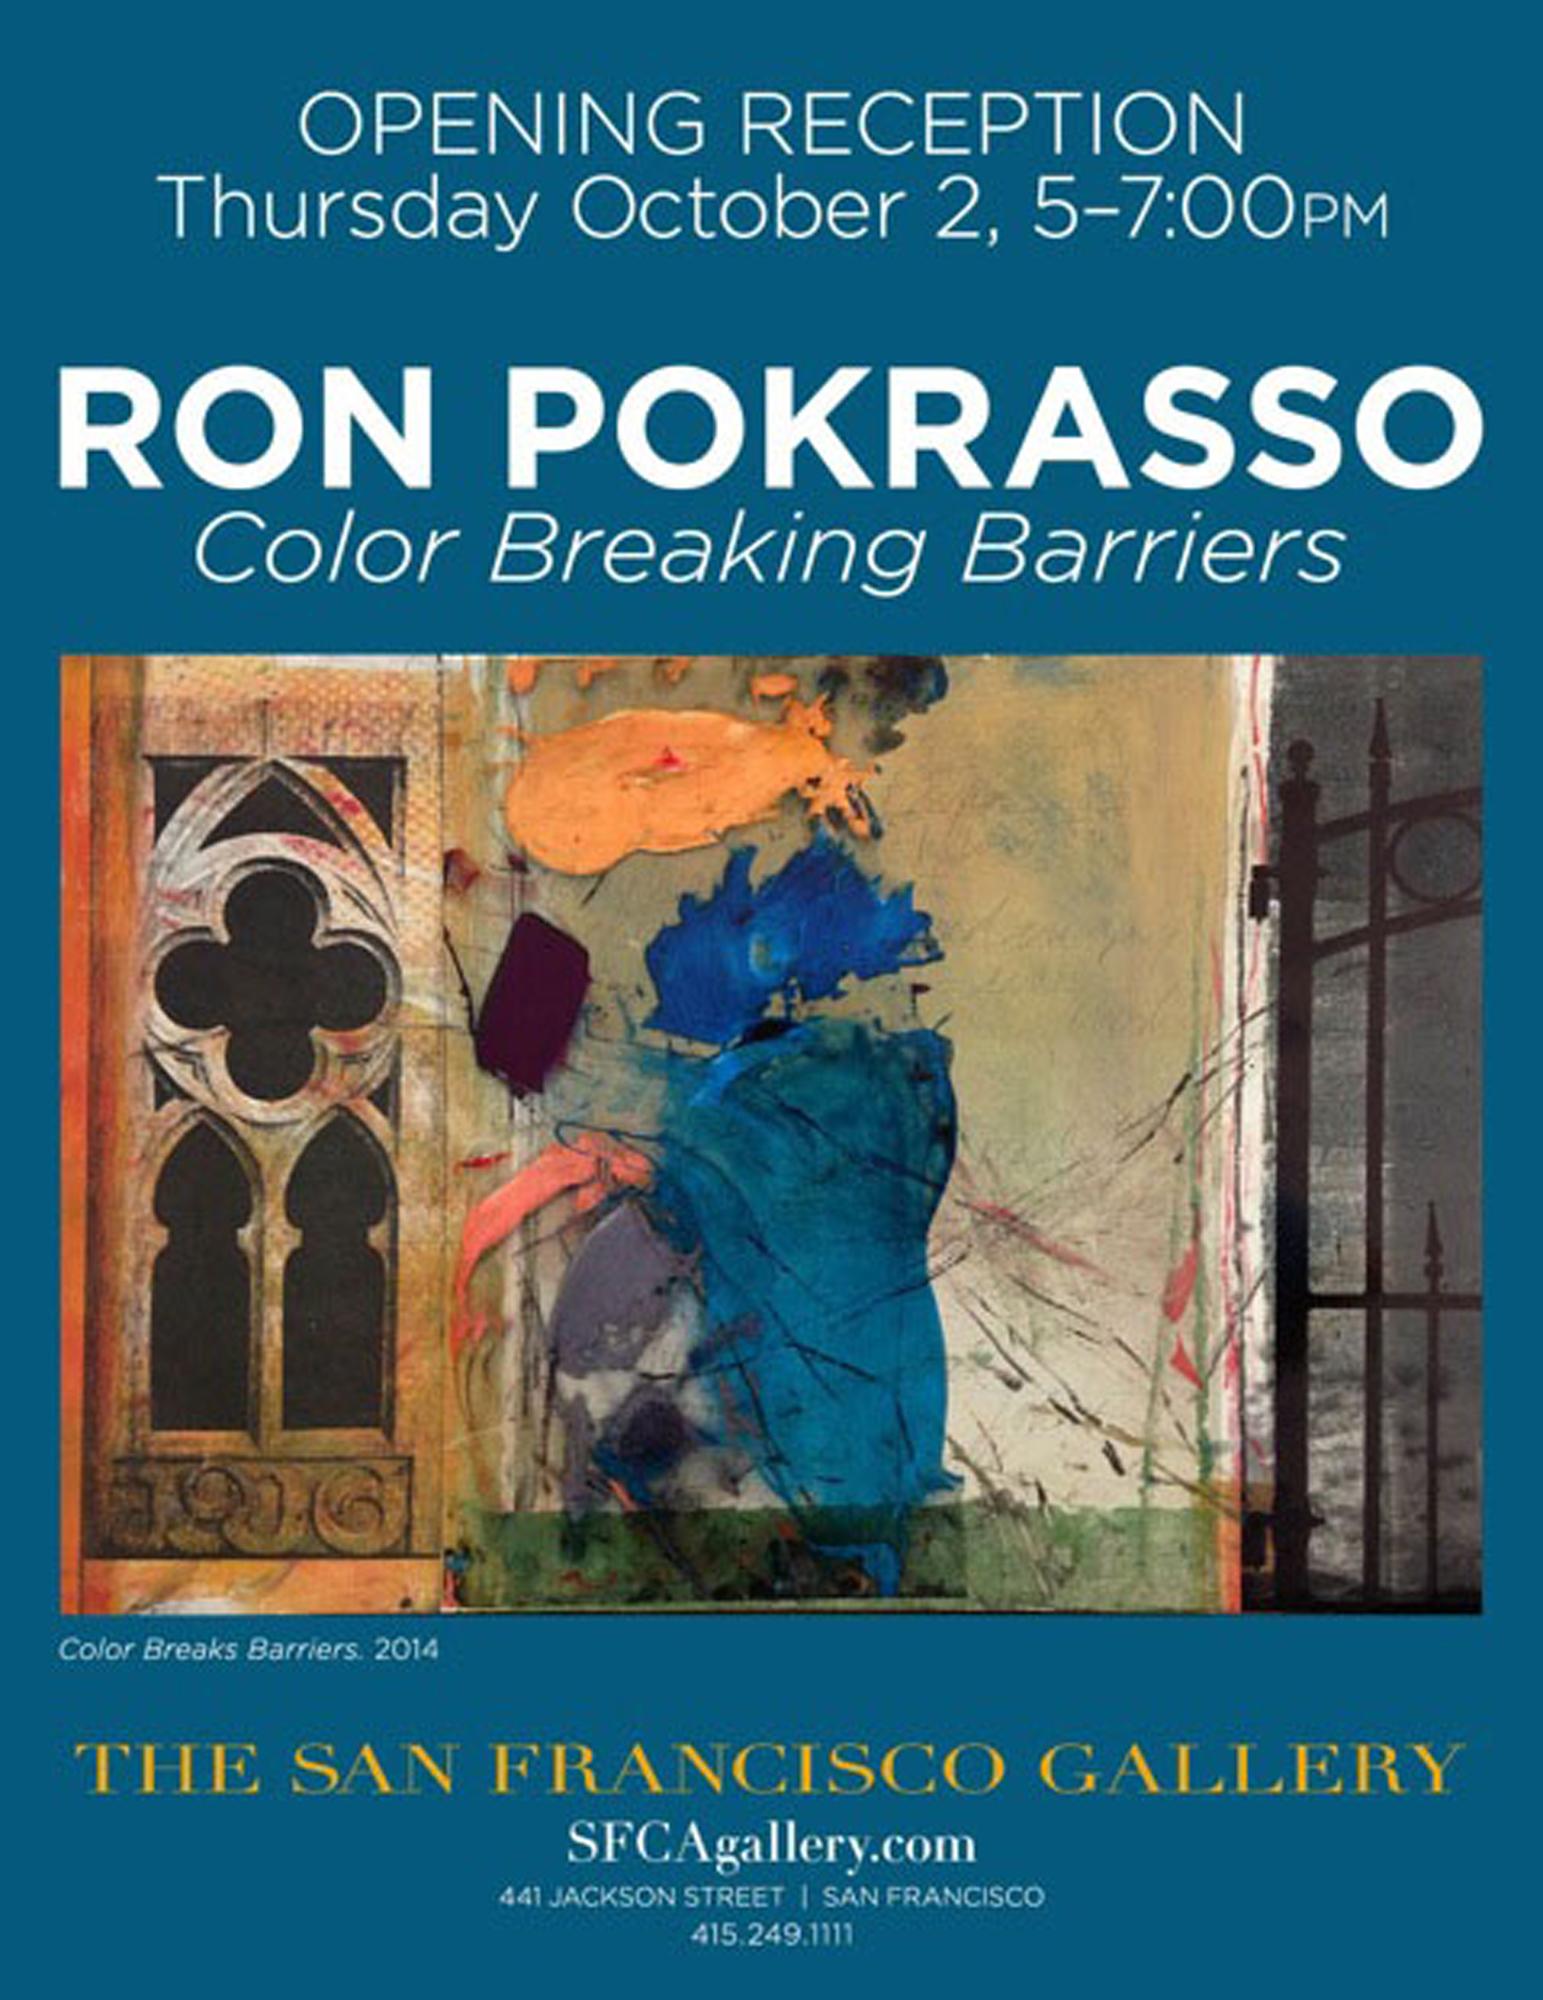 Color Breaking Barriers